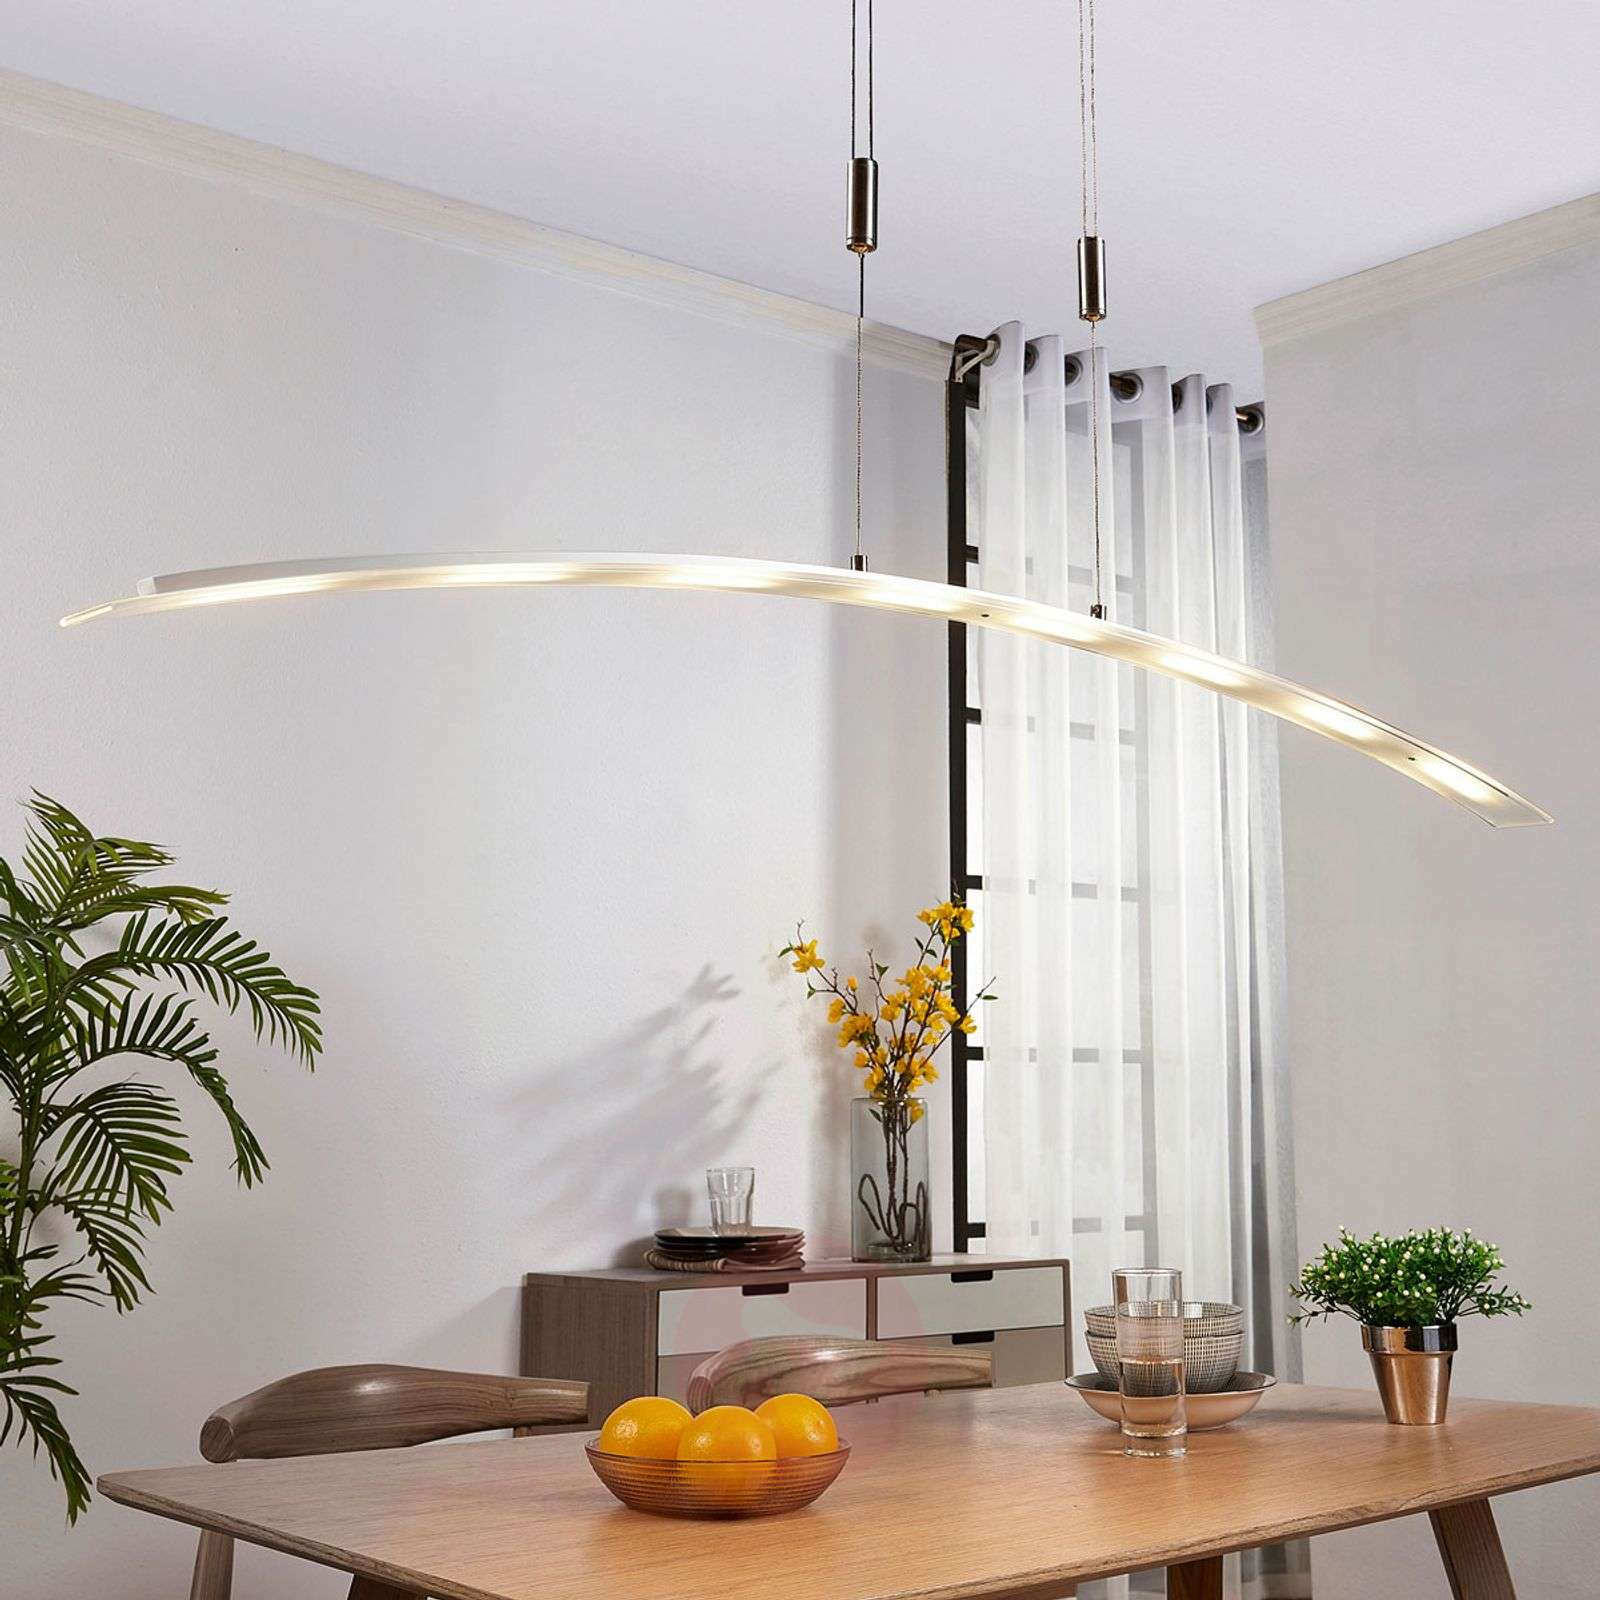 Manon height-adjustable LED pendant lamp-9621081-01